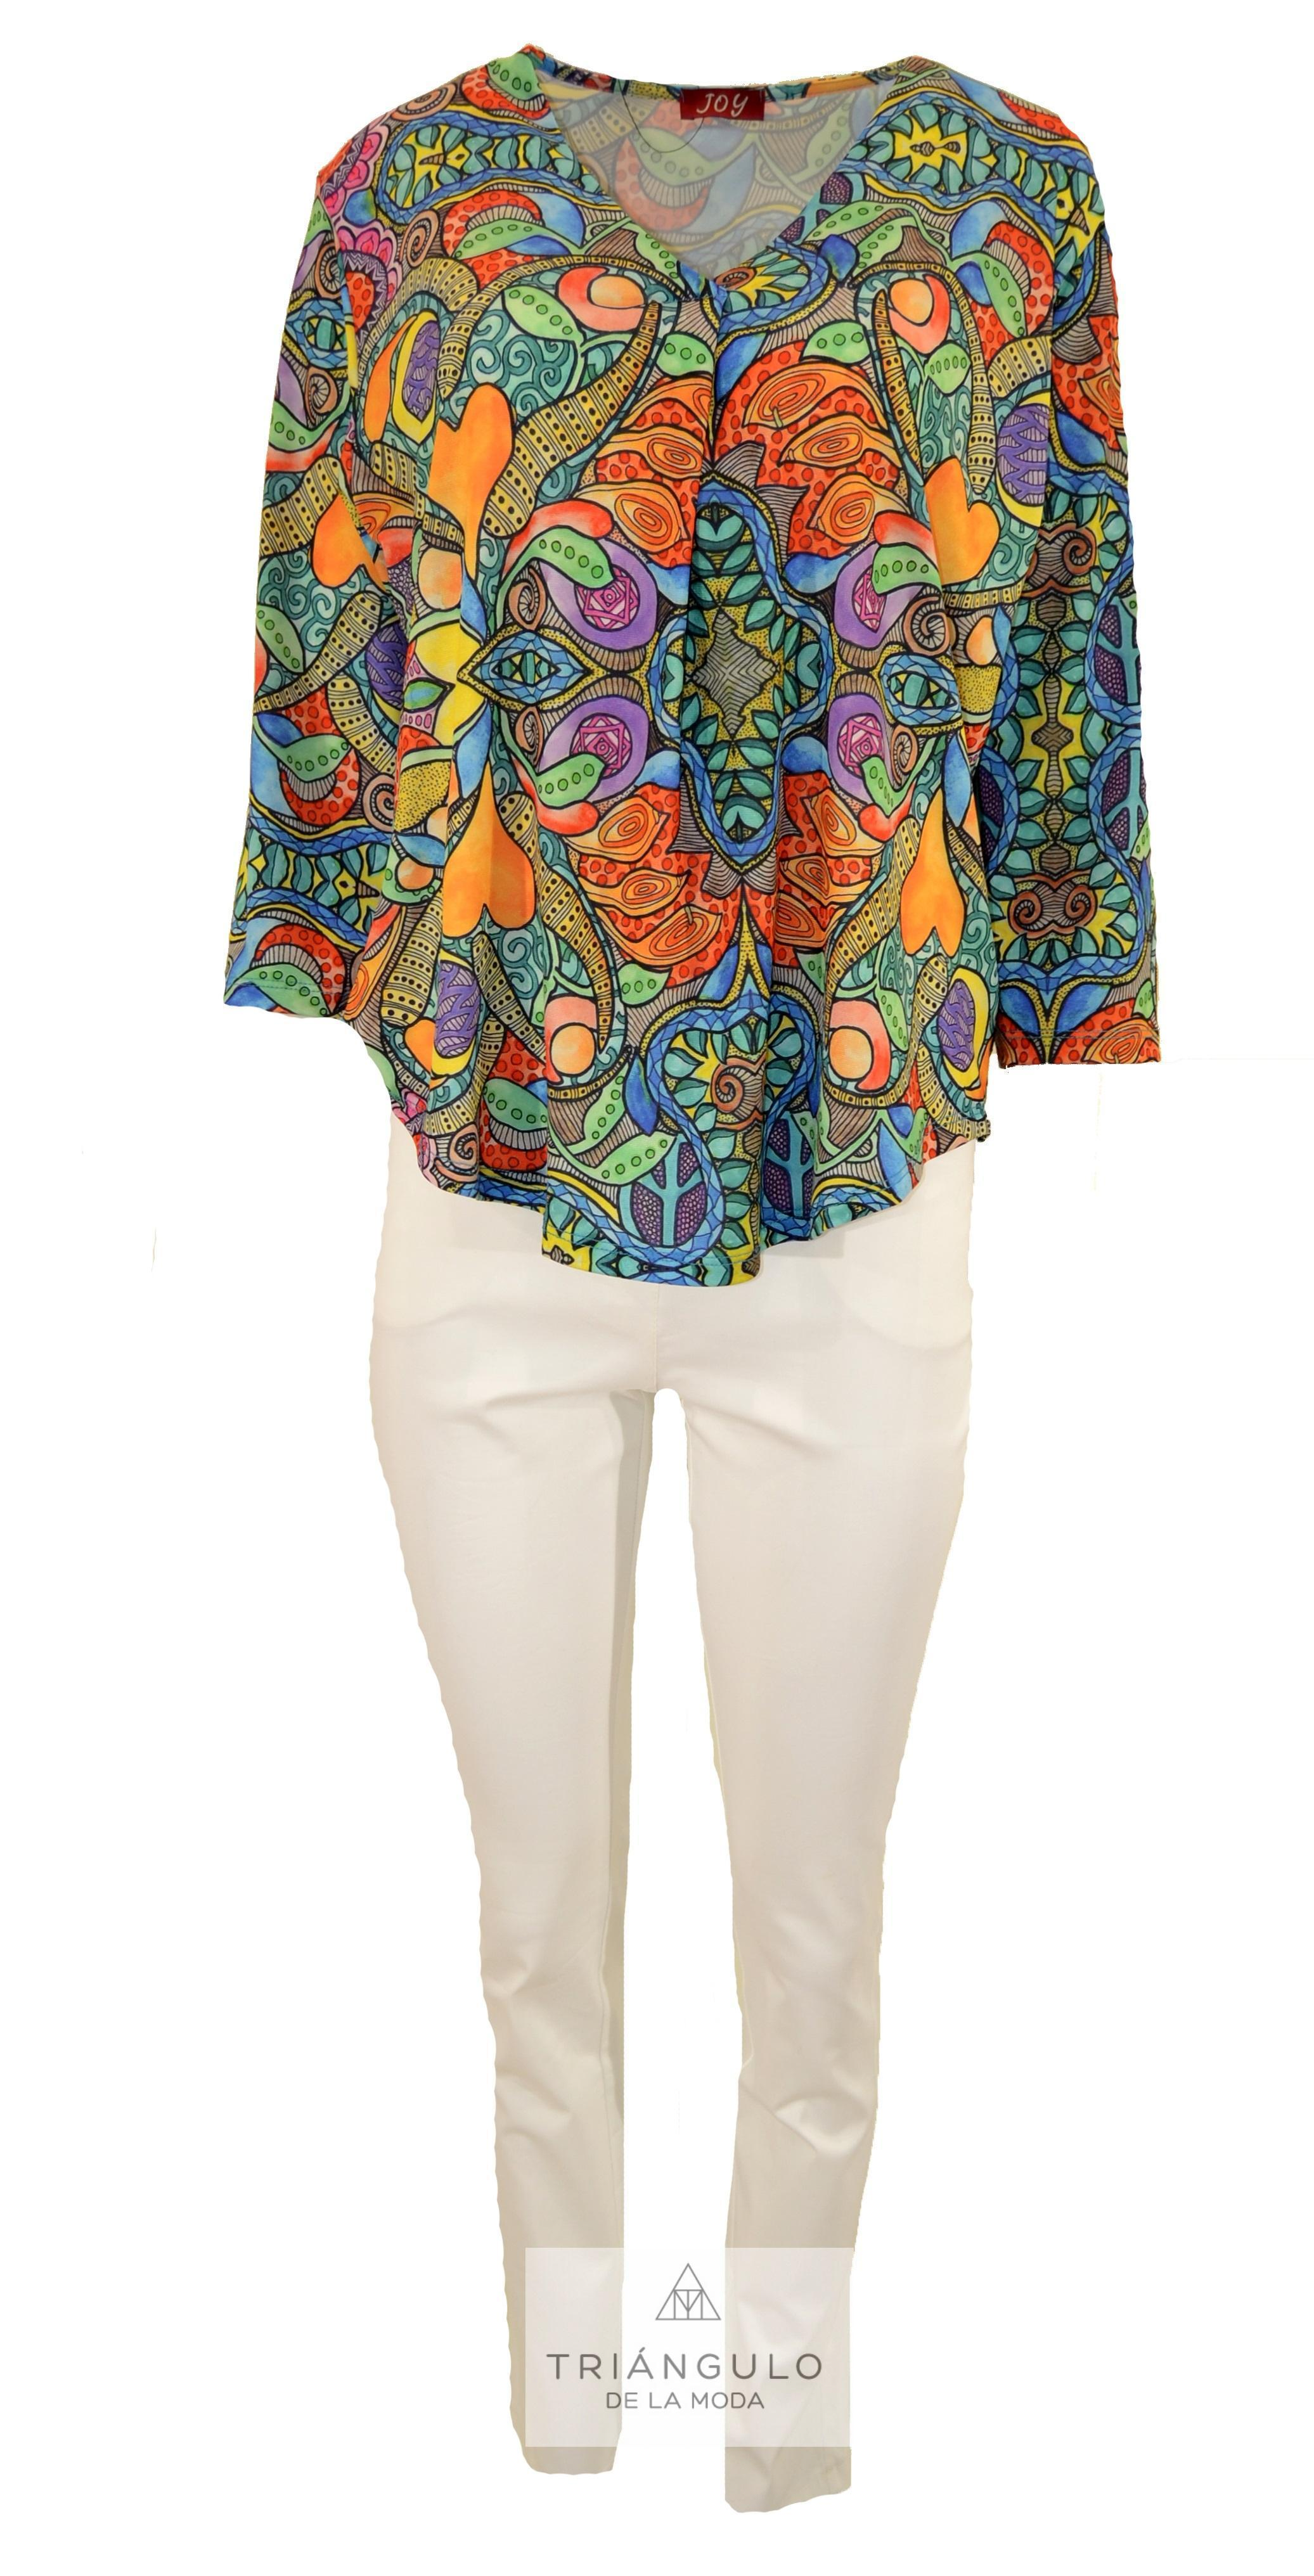 Tienda online del Triangulo de la Moda CAMISA MANGA CORTA